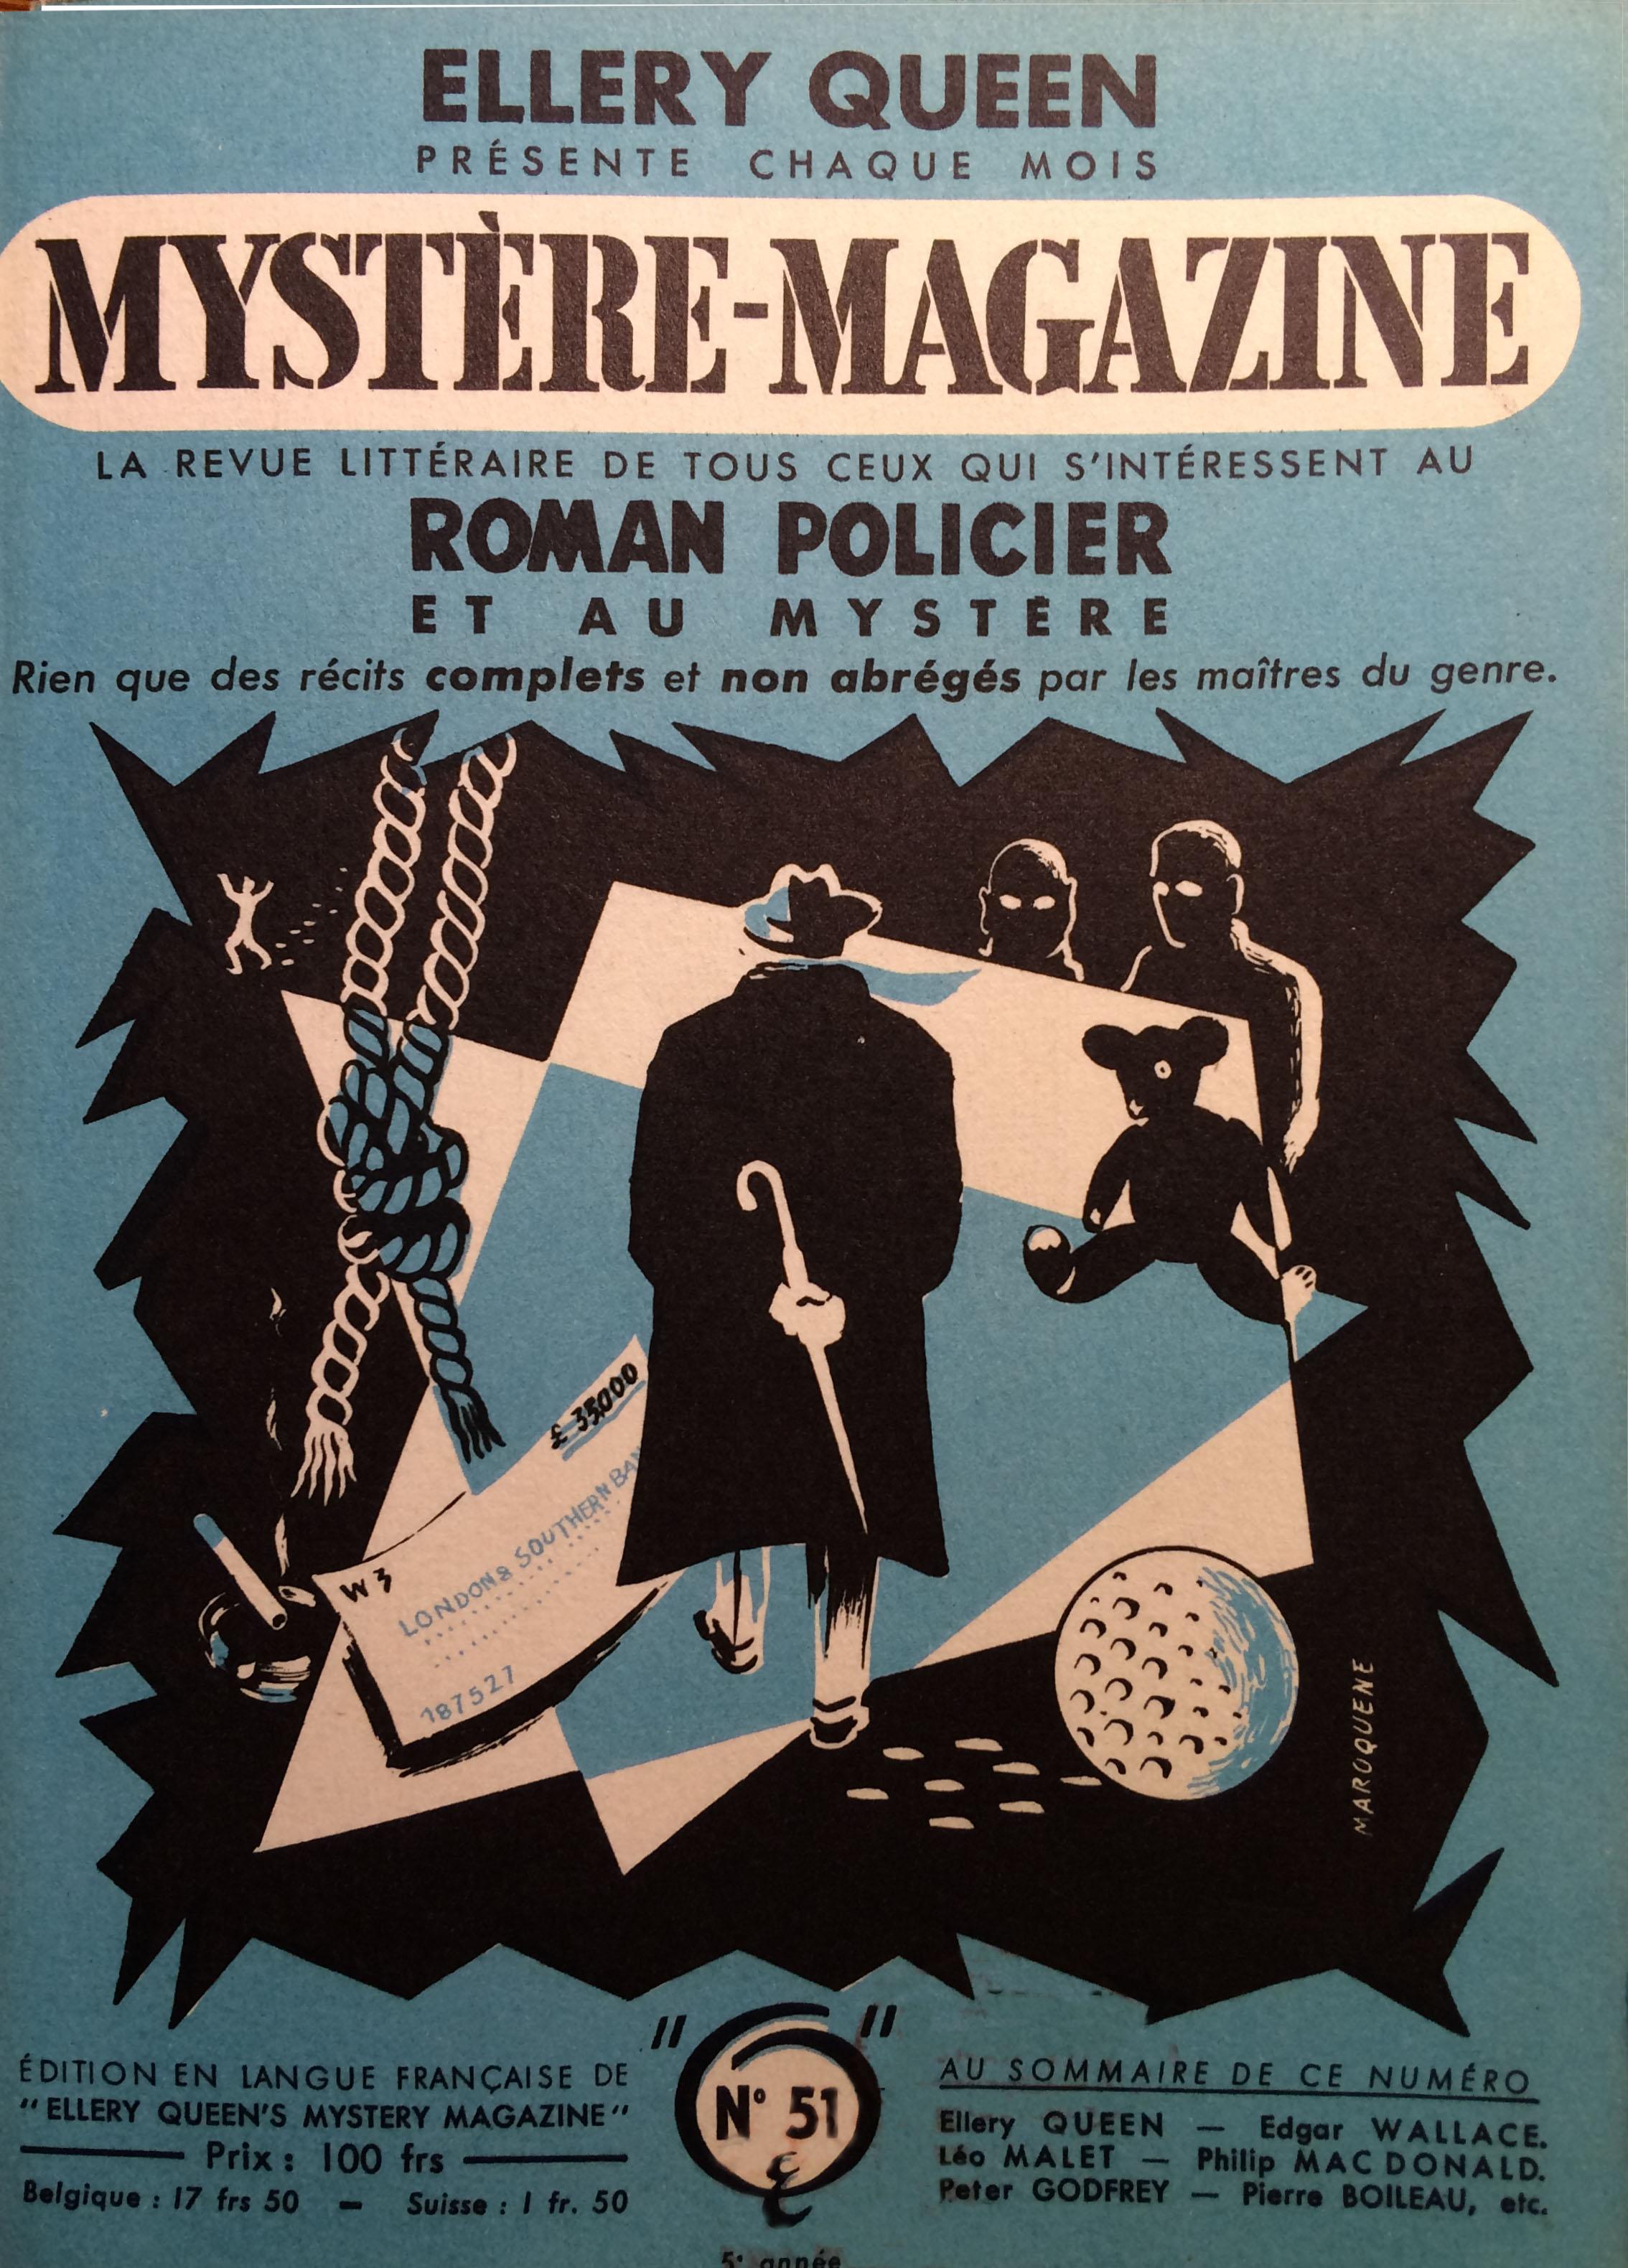 Mystère magazine n°51